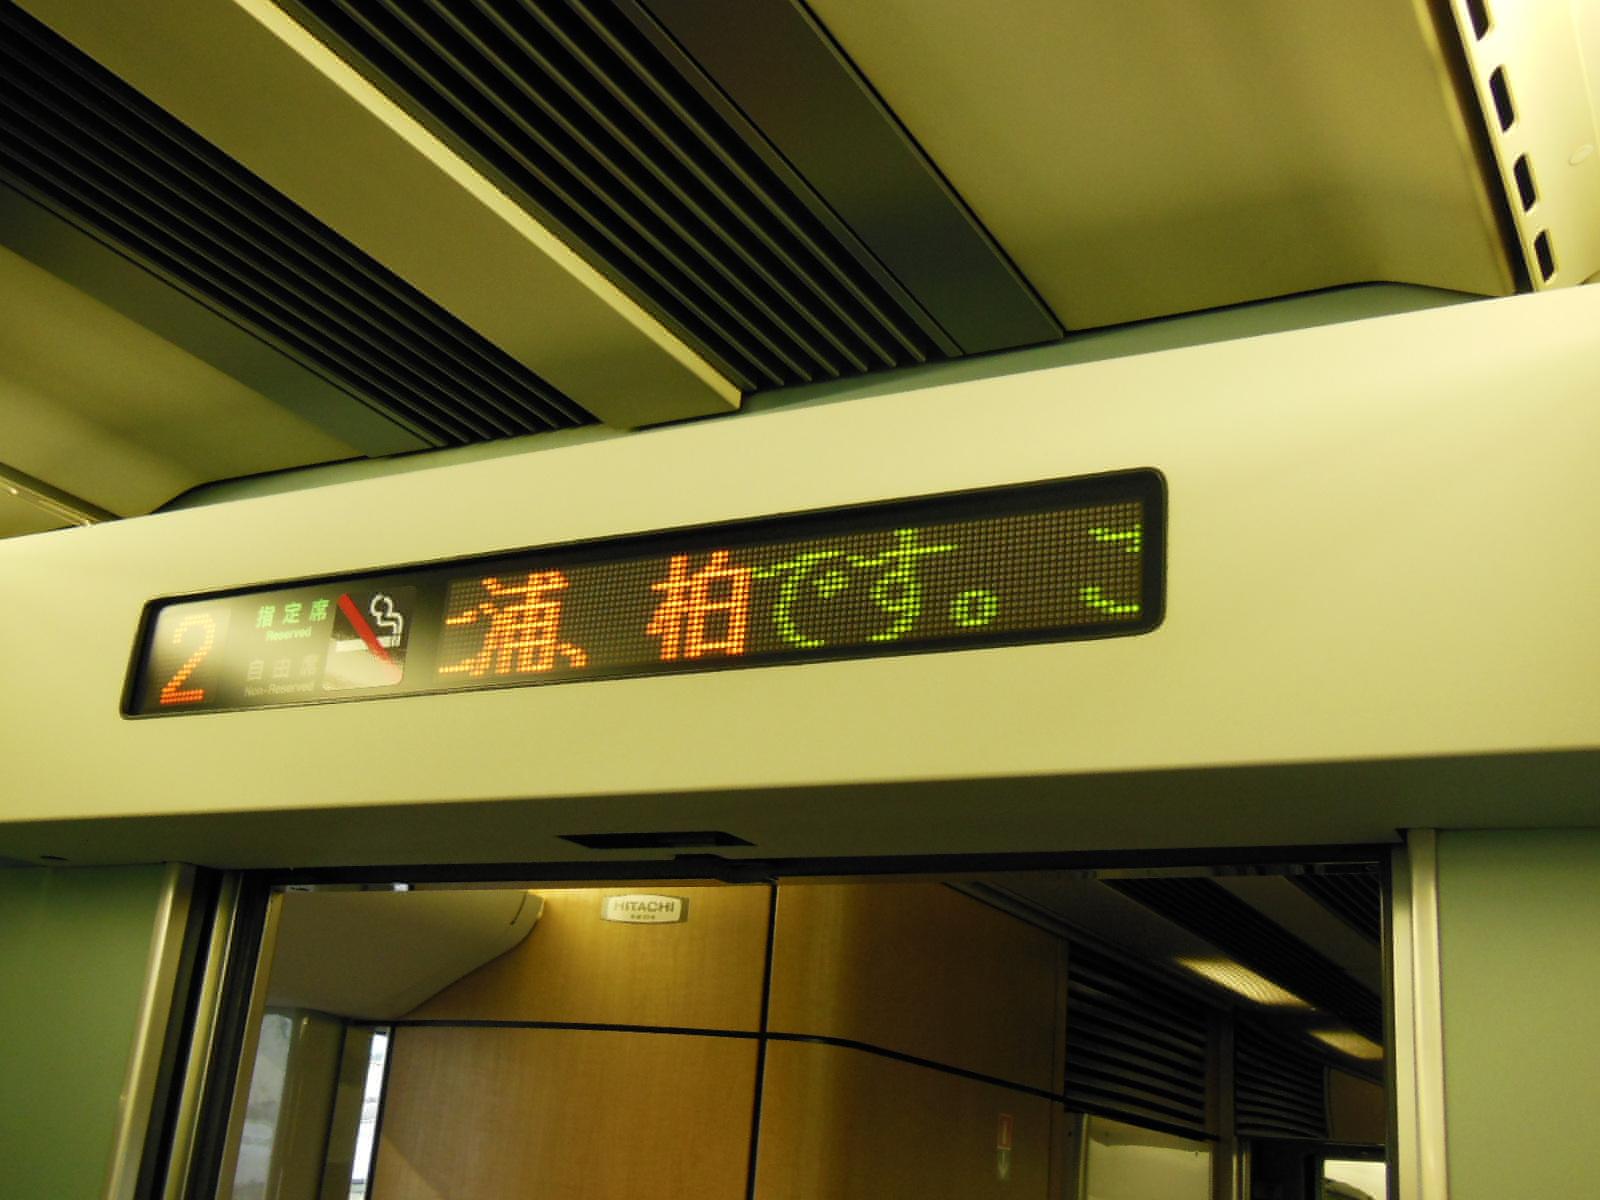 E653系K308(青)編成臨時fひたち98号 (1)